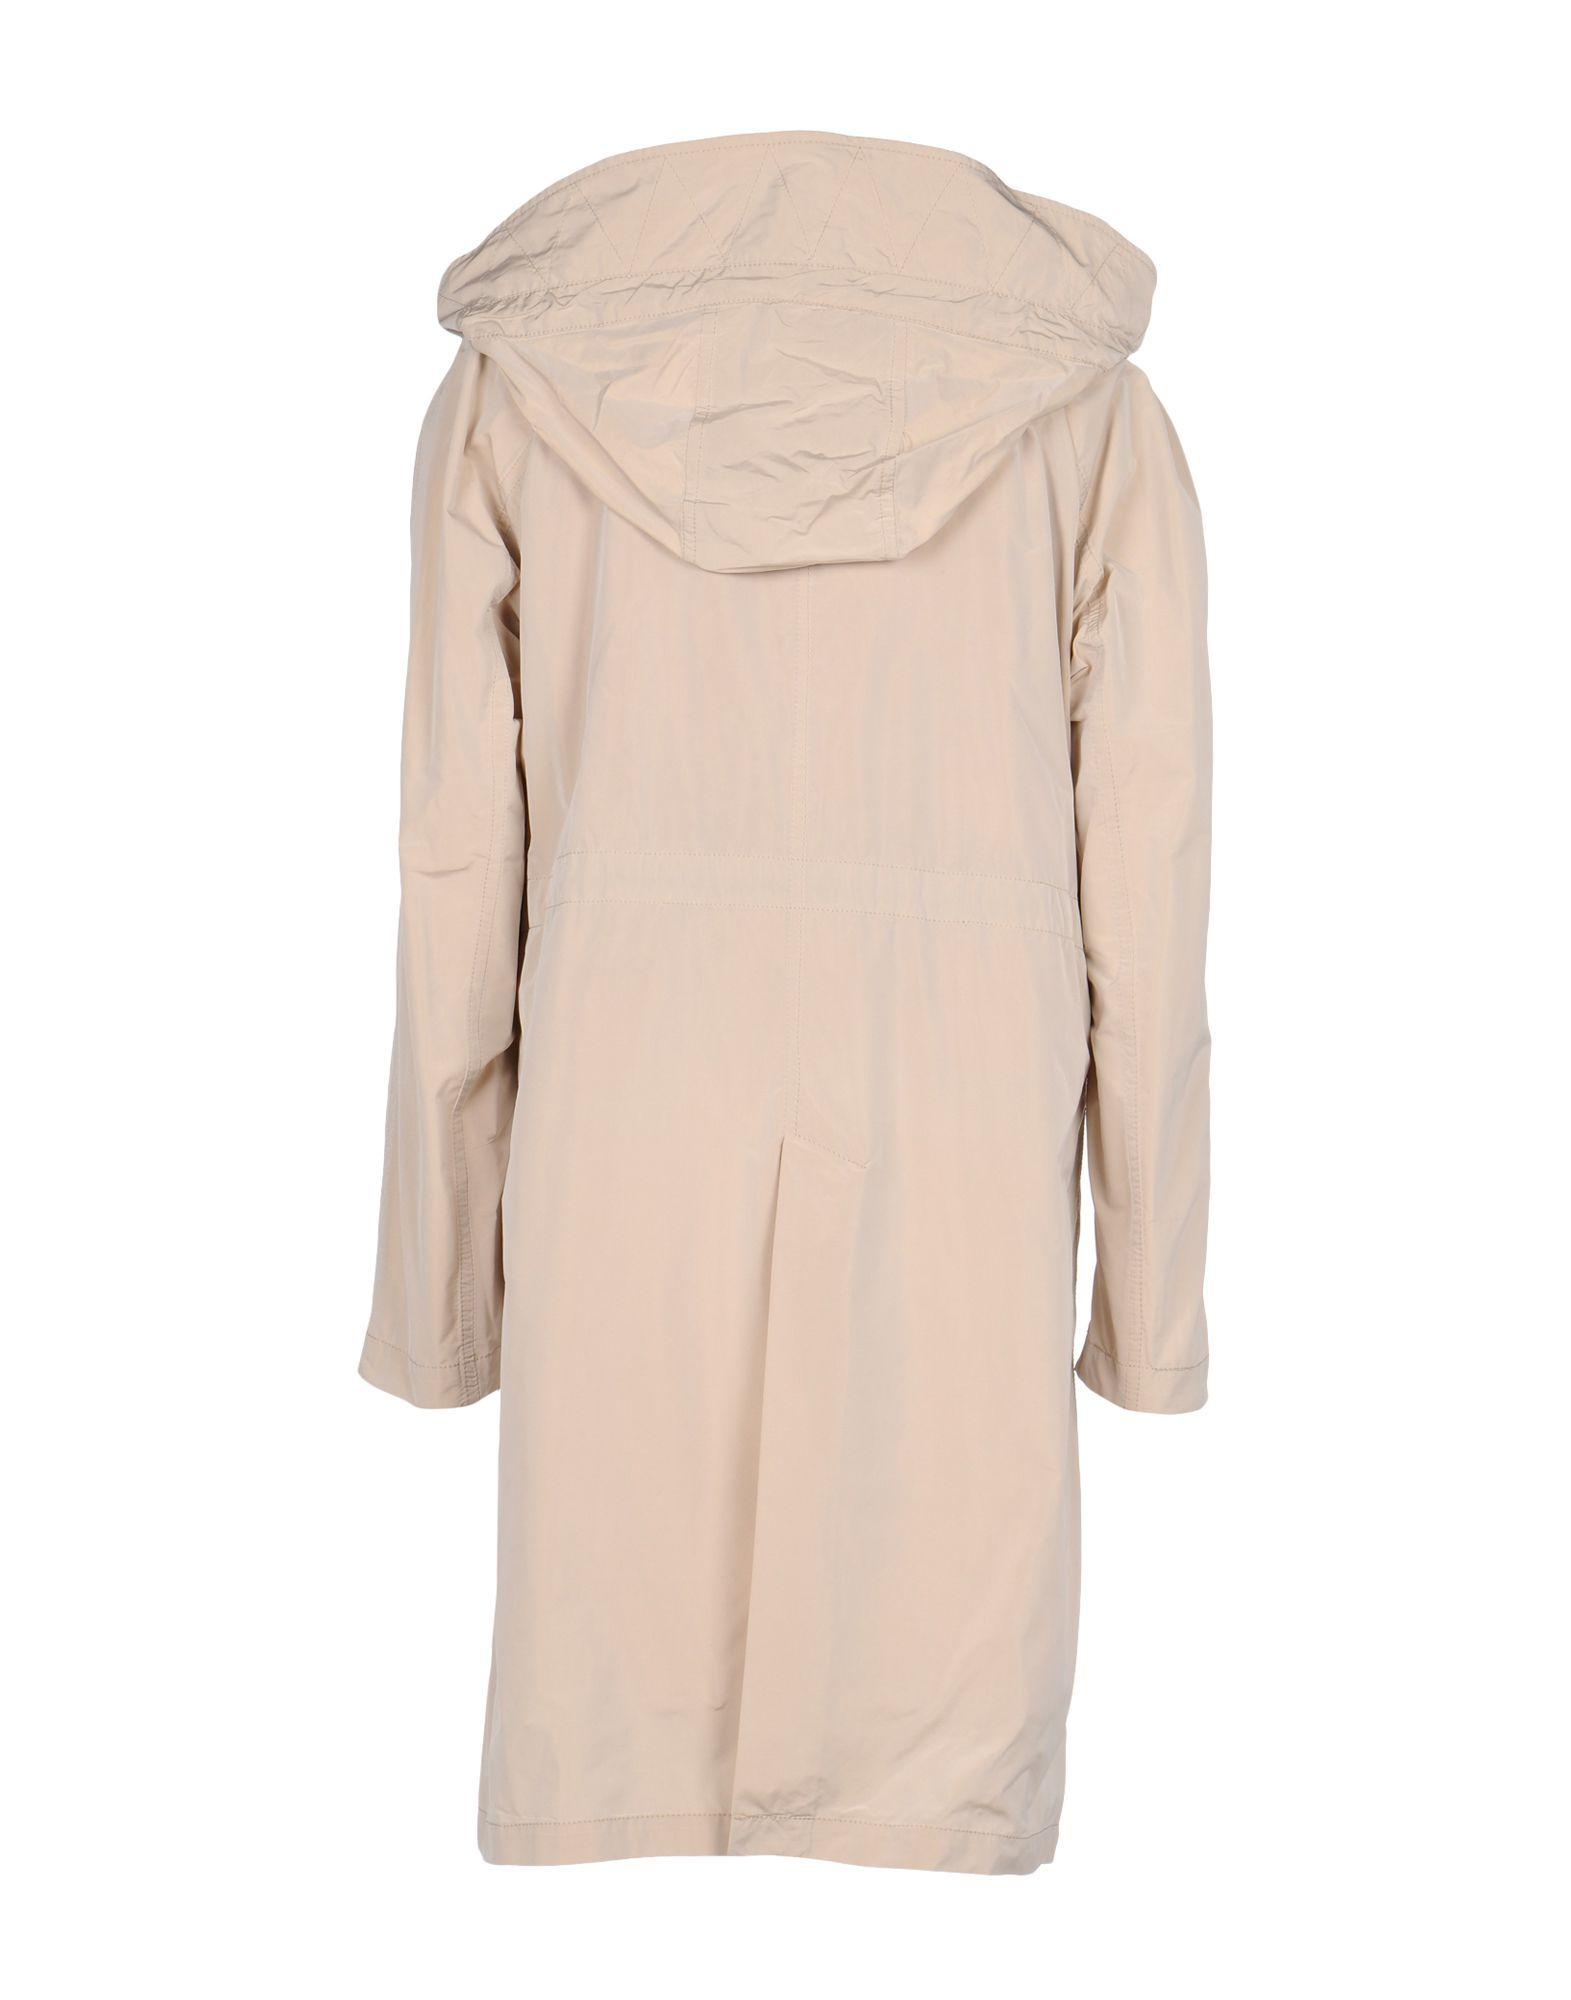 COATS & JACKETS Moorer Beige Woman Polyester